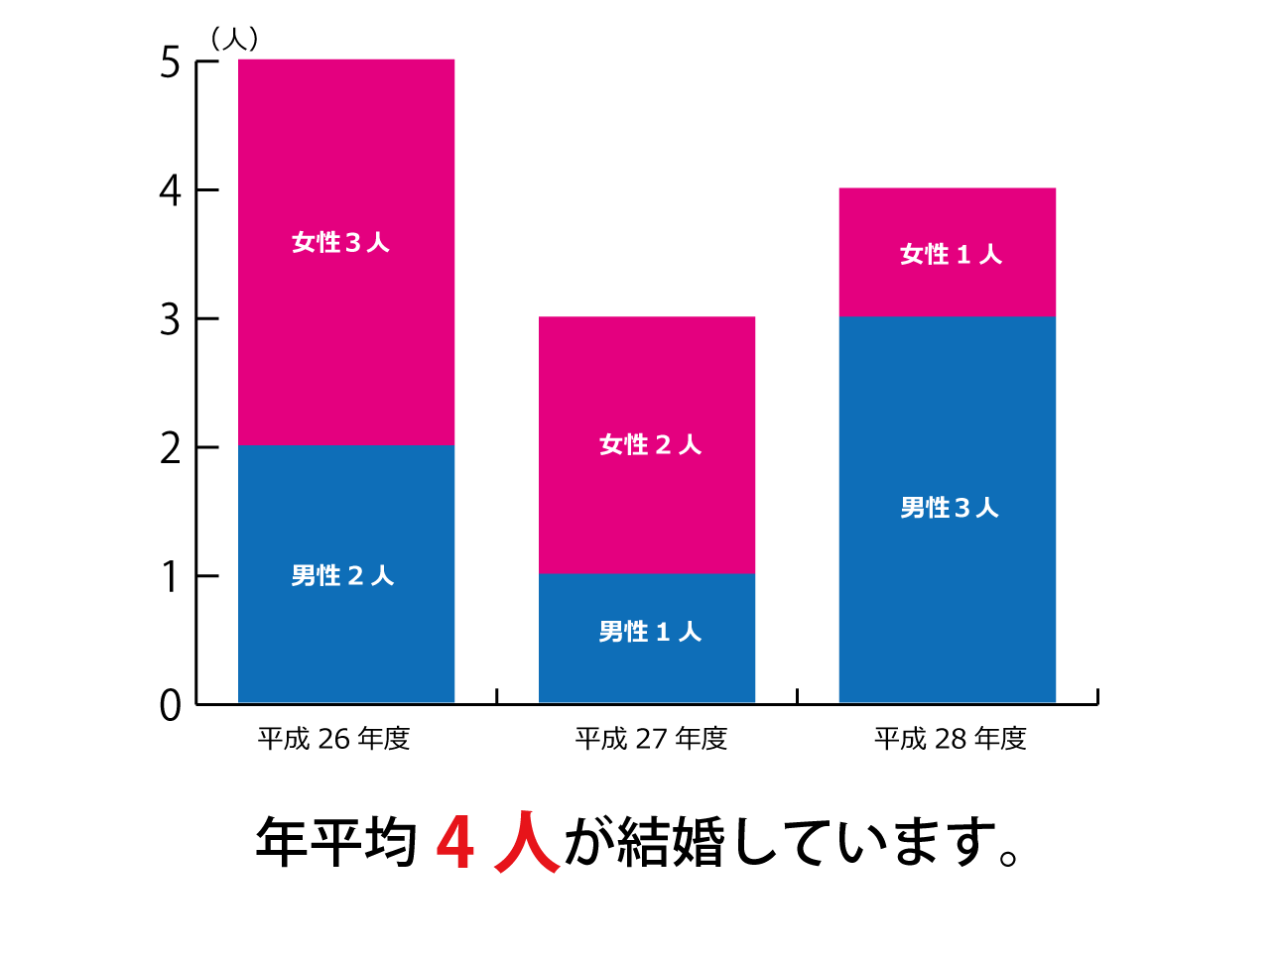 年平均4人が結婚(過去3年)